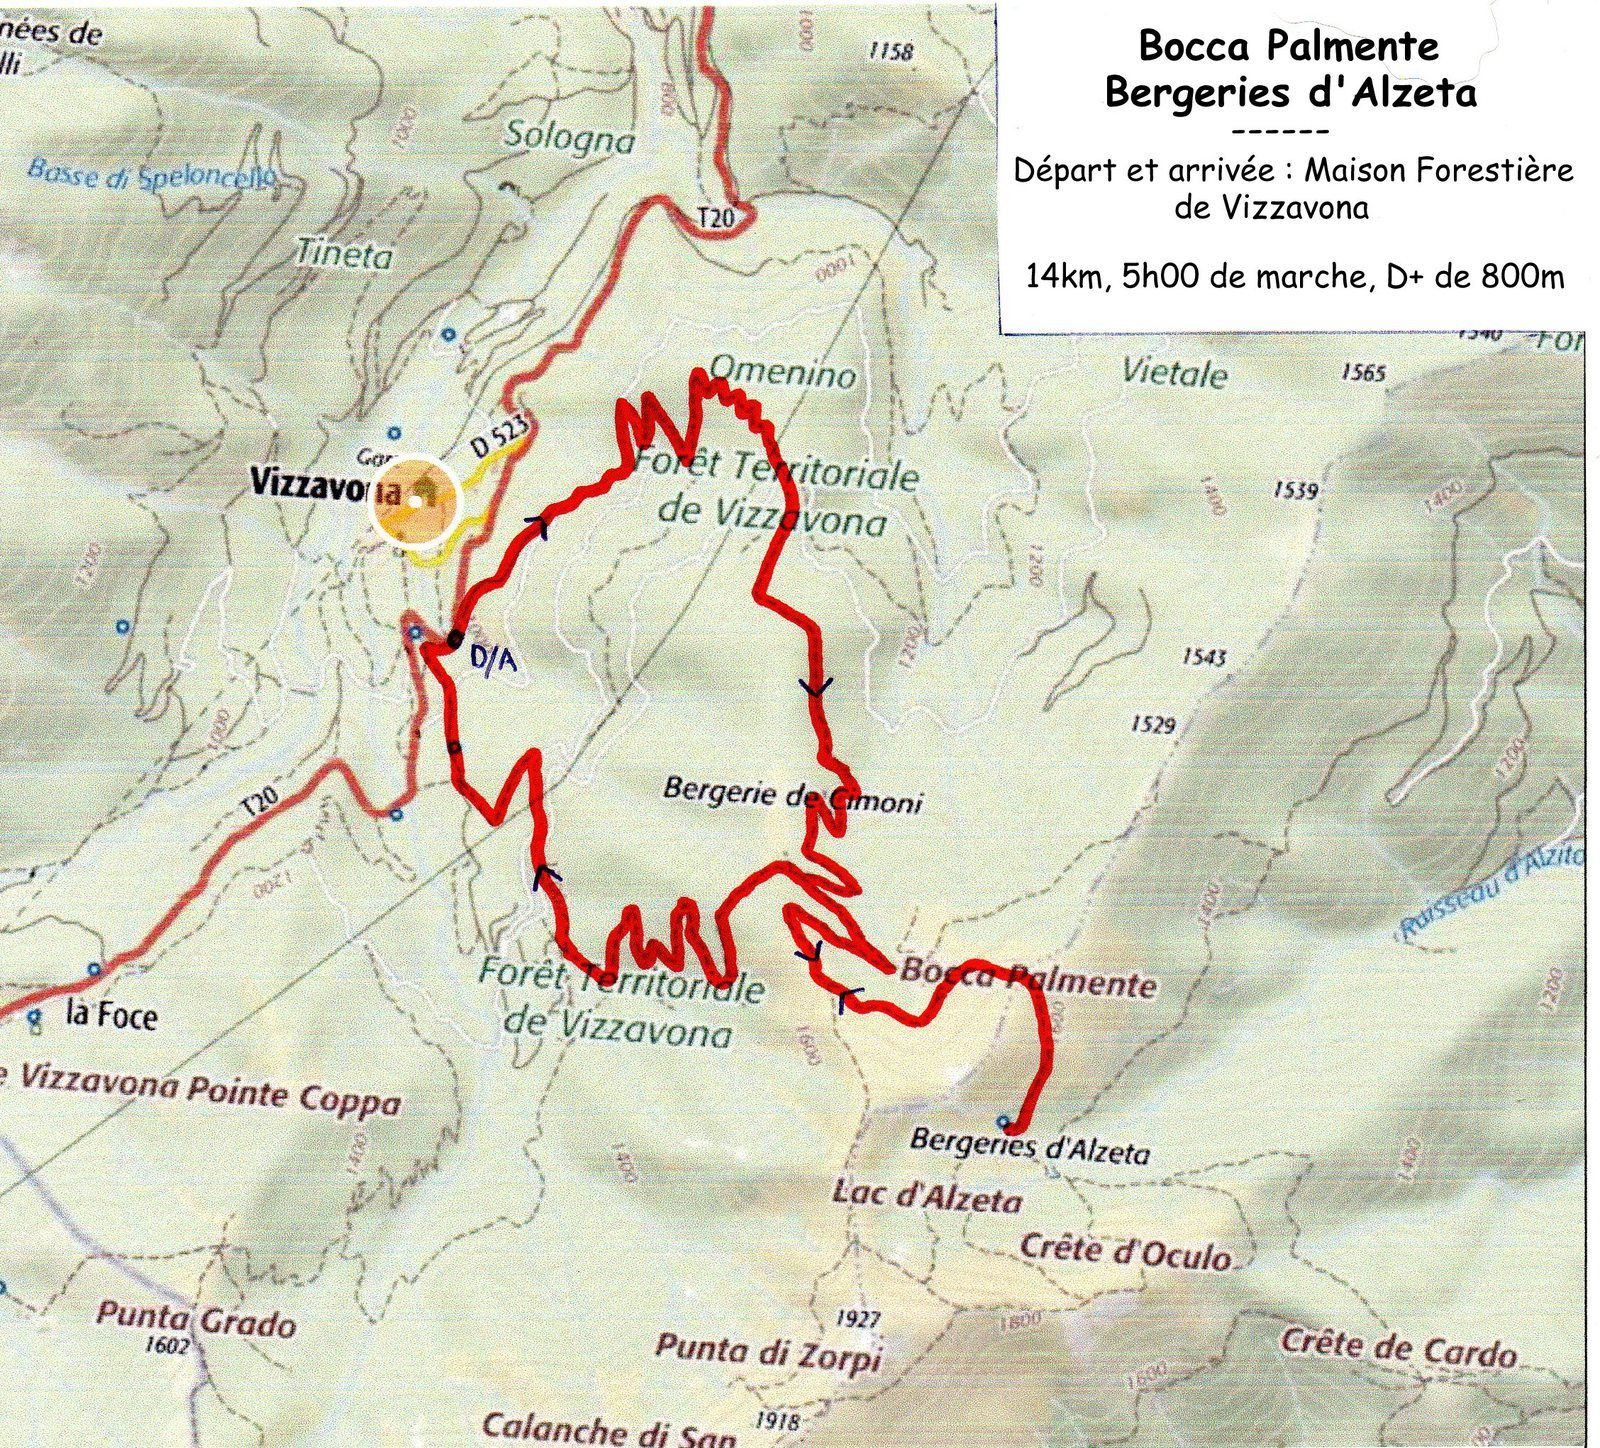 Randonnée du 6 août 2017 : Vizzavona - Bocca Palmente - Bergeries d'Alzeta